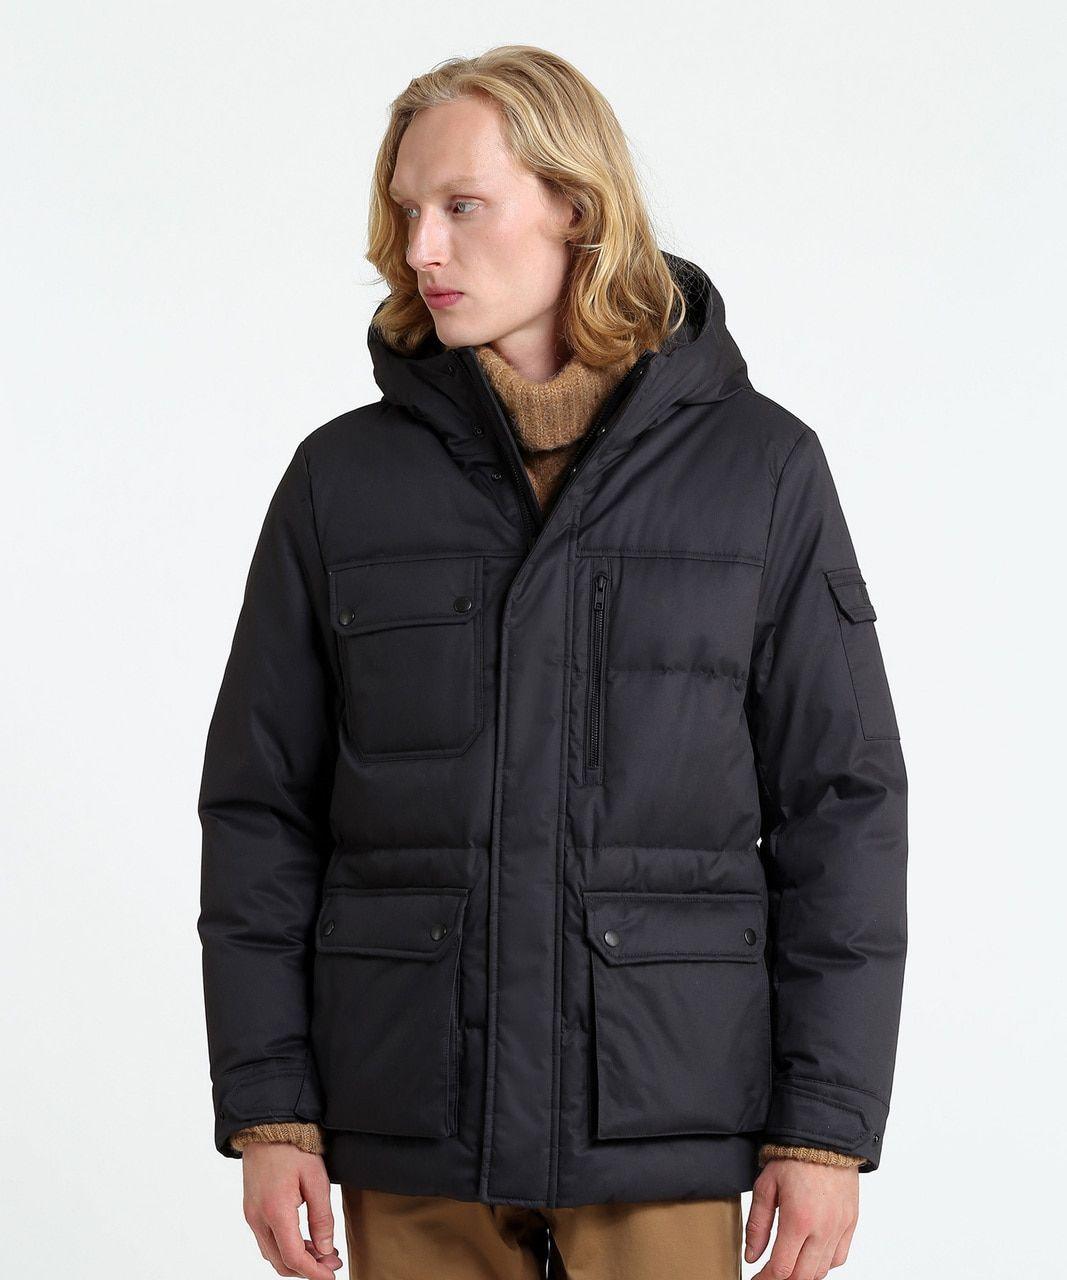 Men S Pocono Mountain Jacket John Rich Bros Outdoor Outfit Mountain Jacket Clothing Company [ 1280 x 1067 Pixel ]